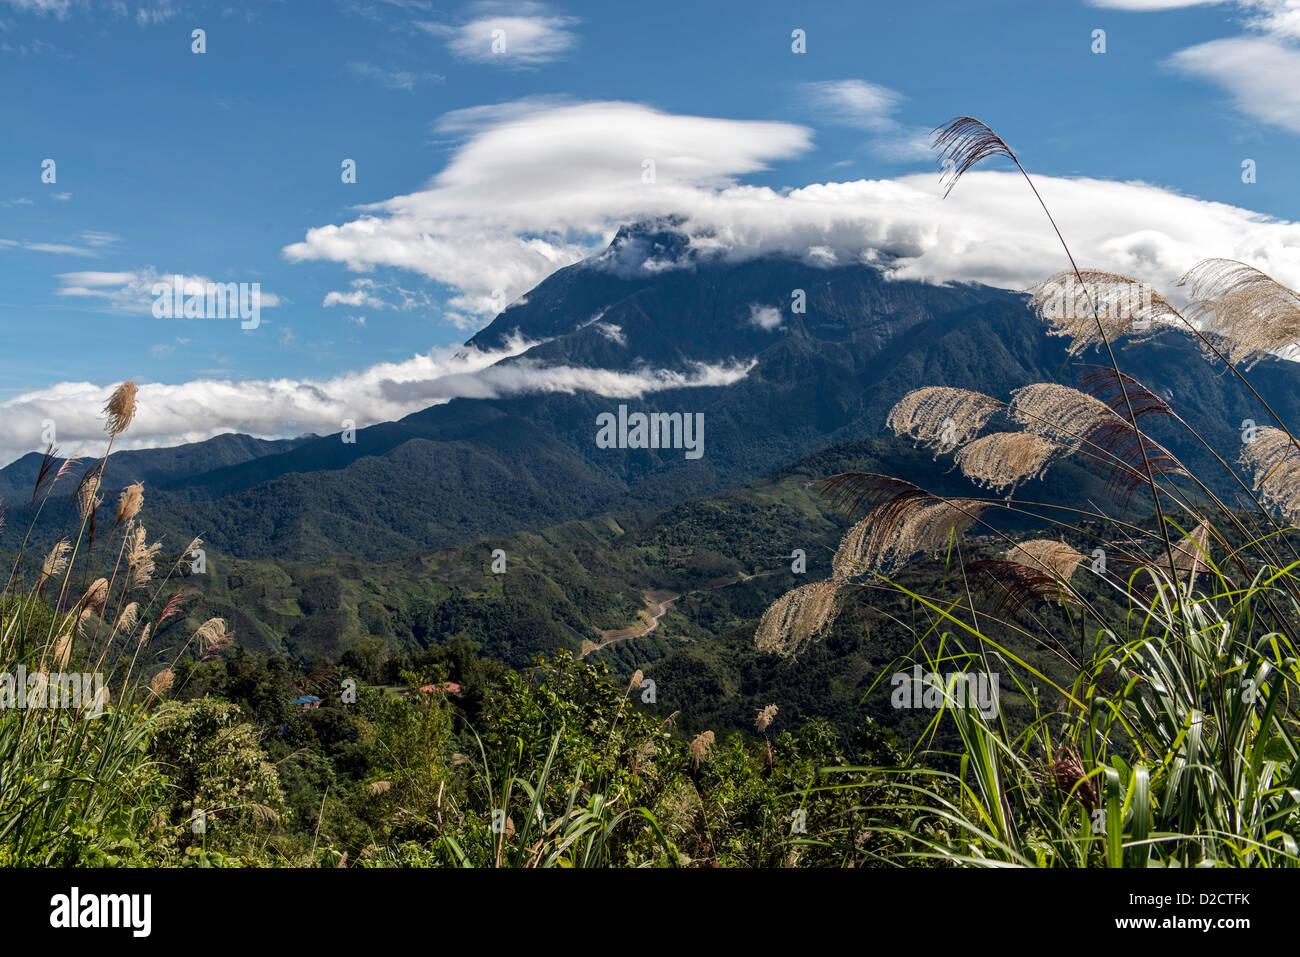 Kota Kinabalu mountain Sabah Borneo Malaysia - Stock Image